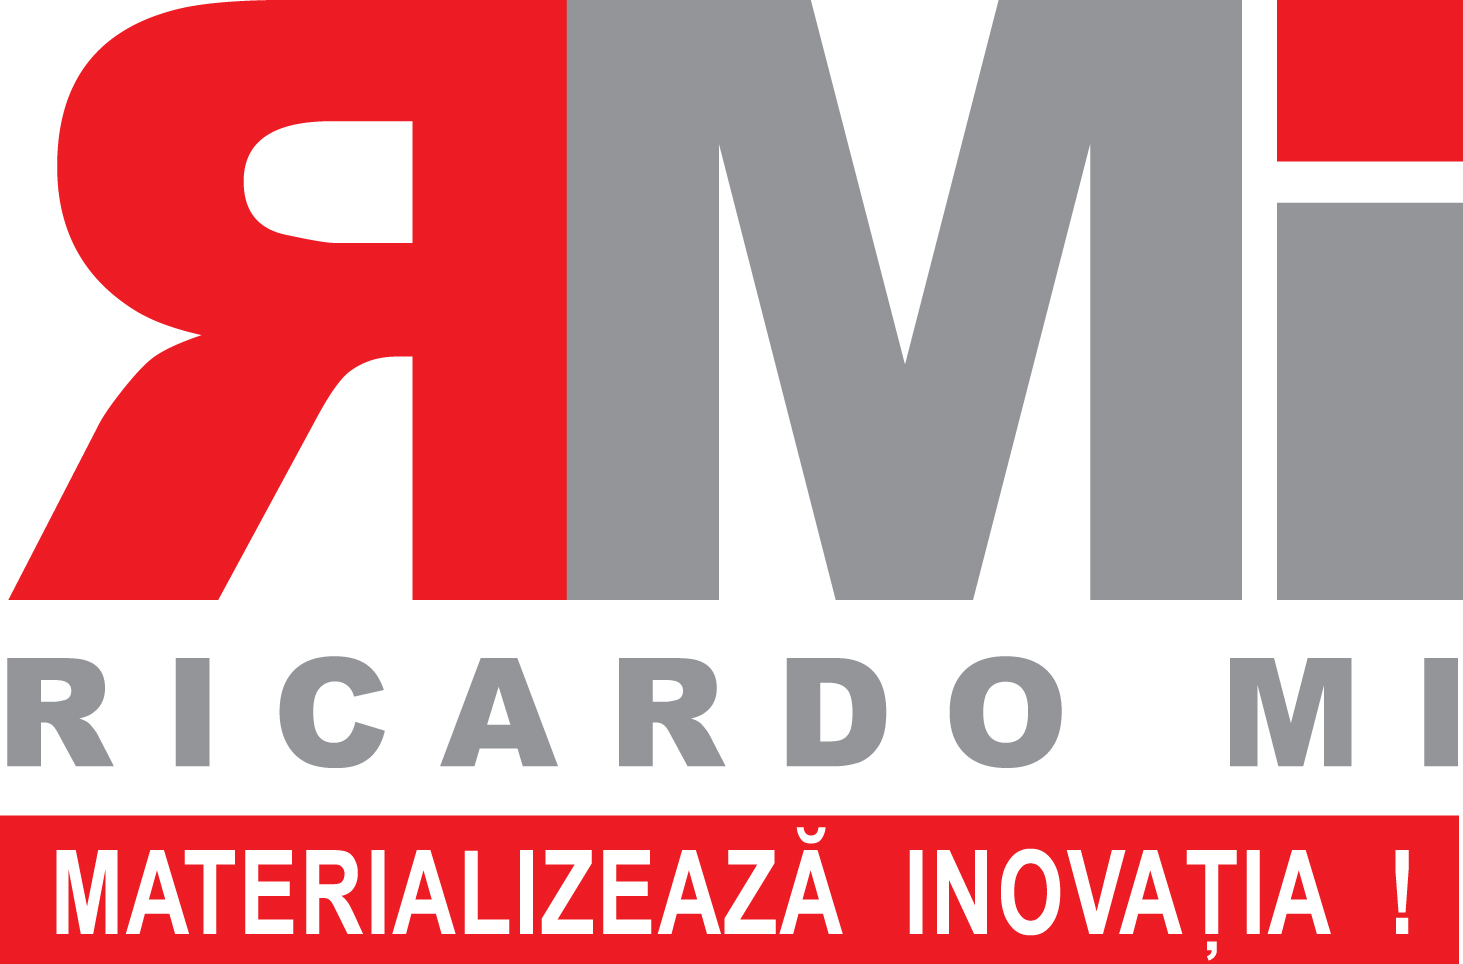 RICARDO-M.I.-IMPEX SRL